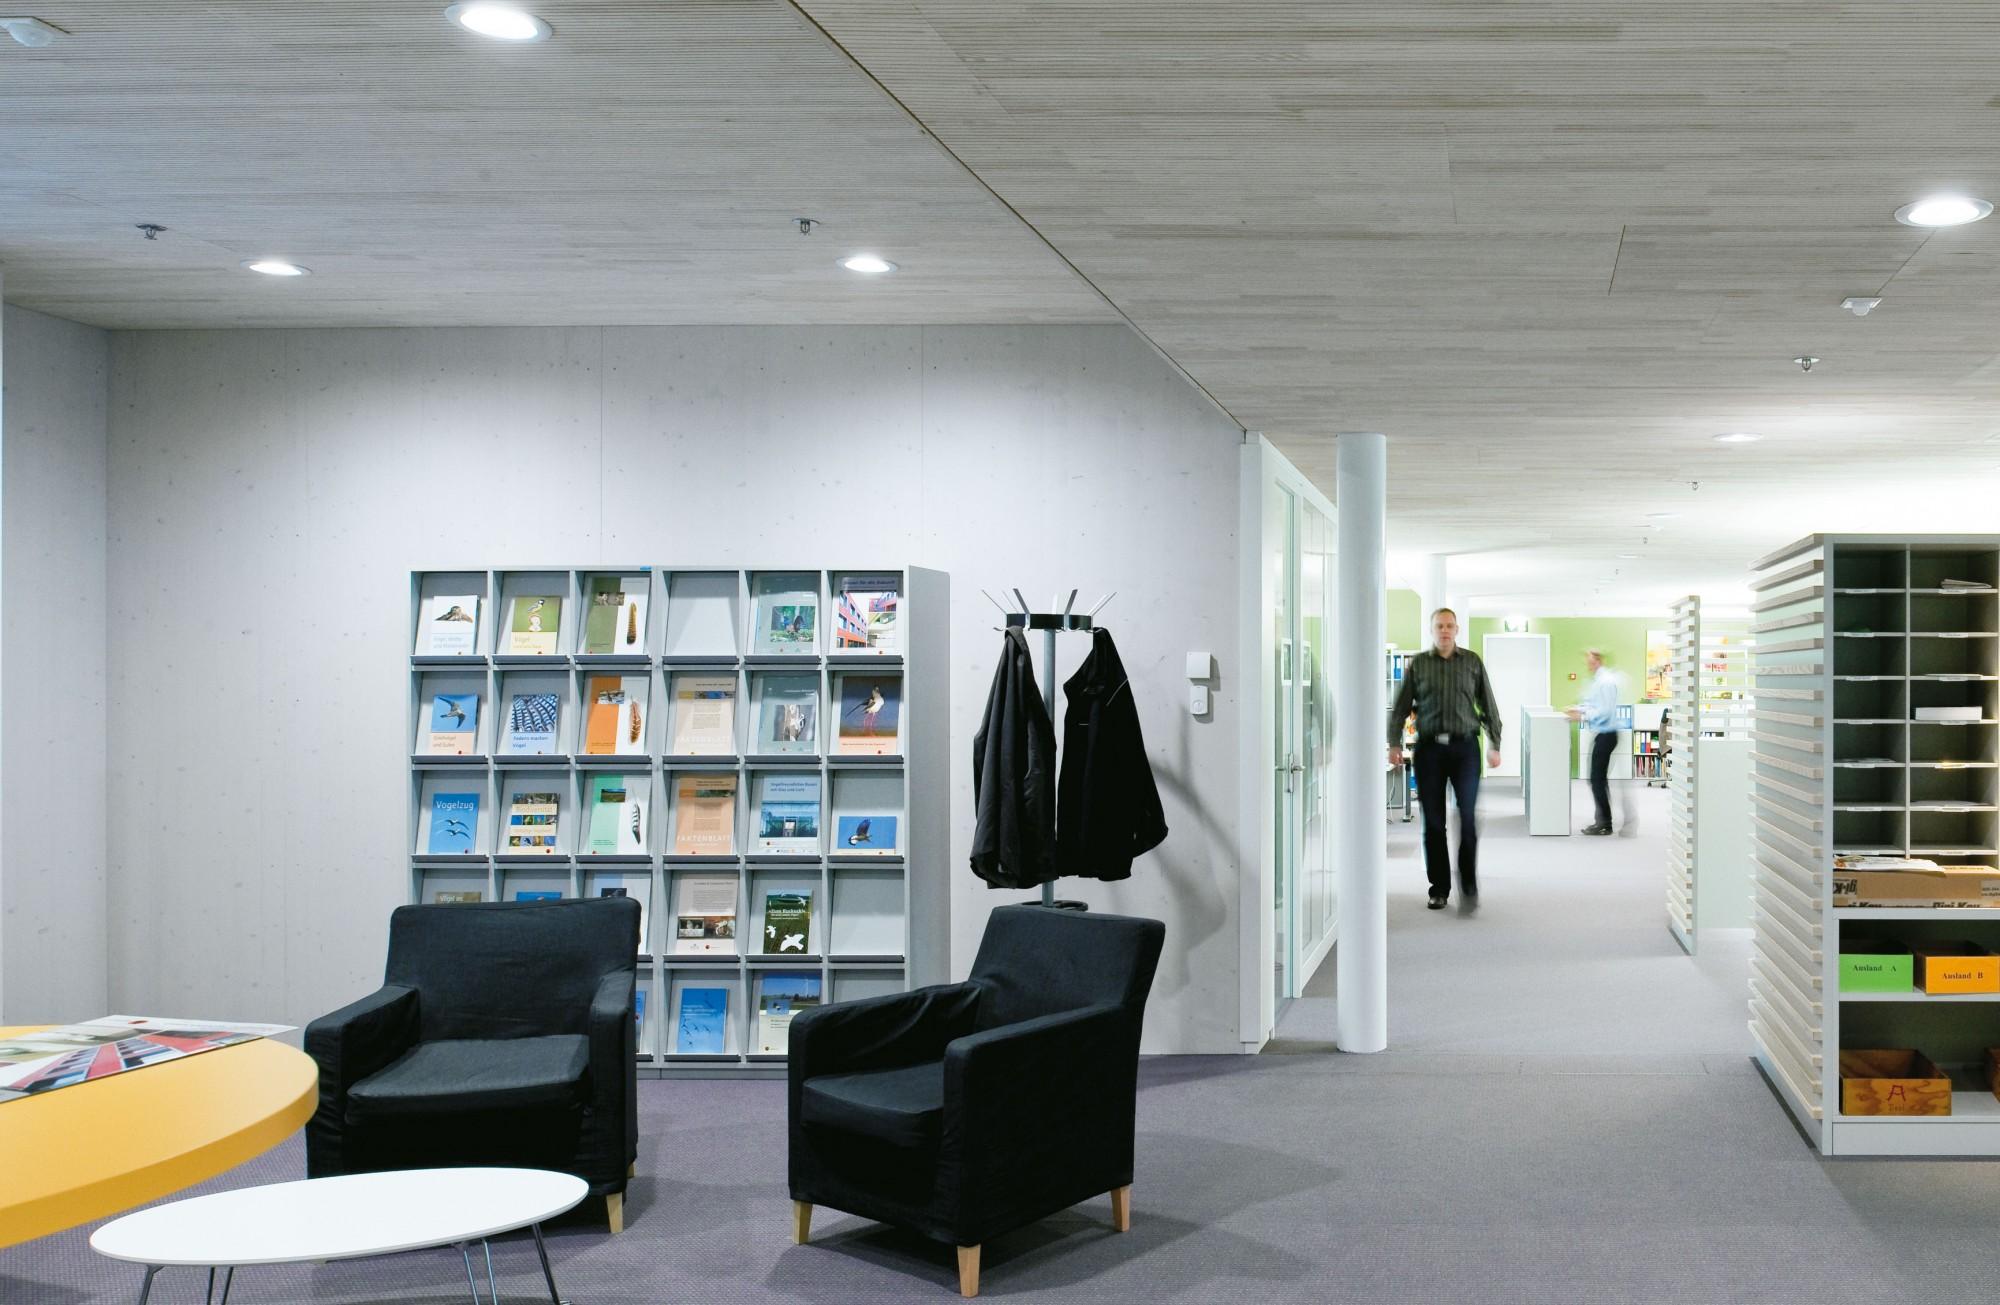 Korridor_Vogelwarte-Sempach_3